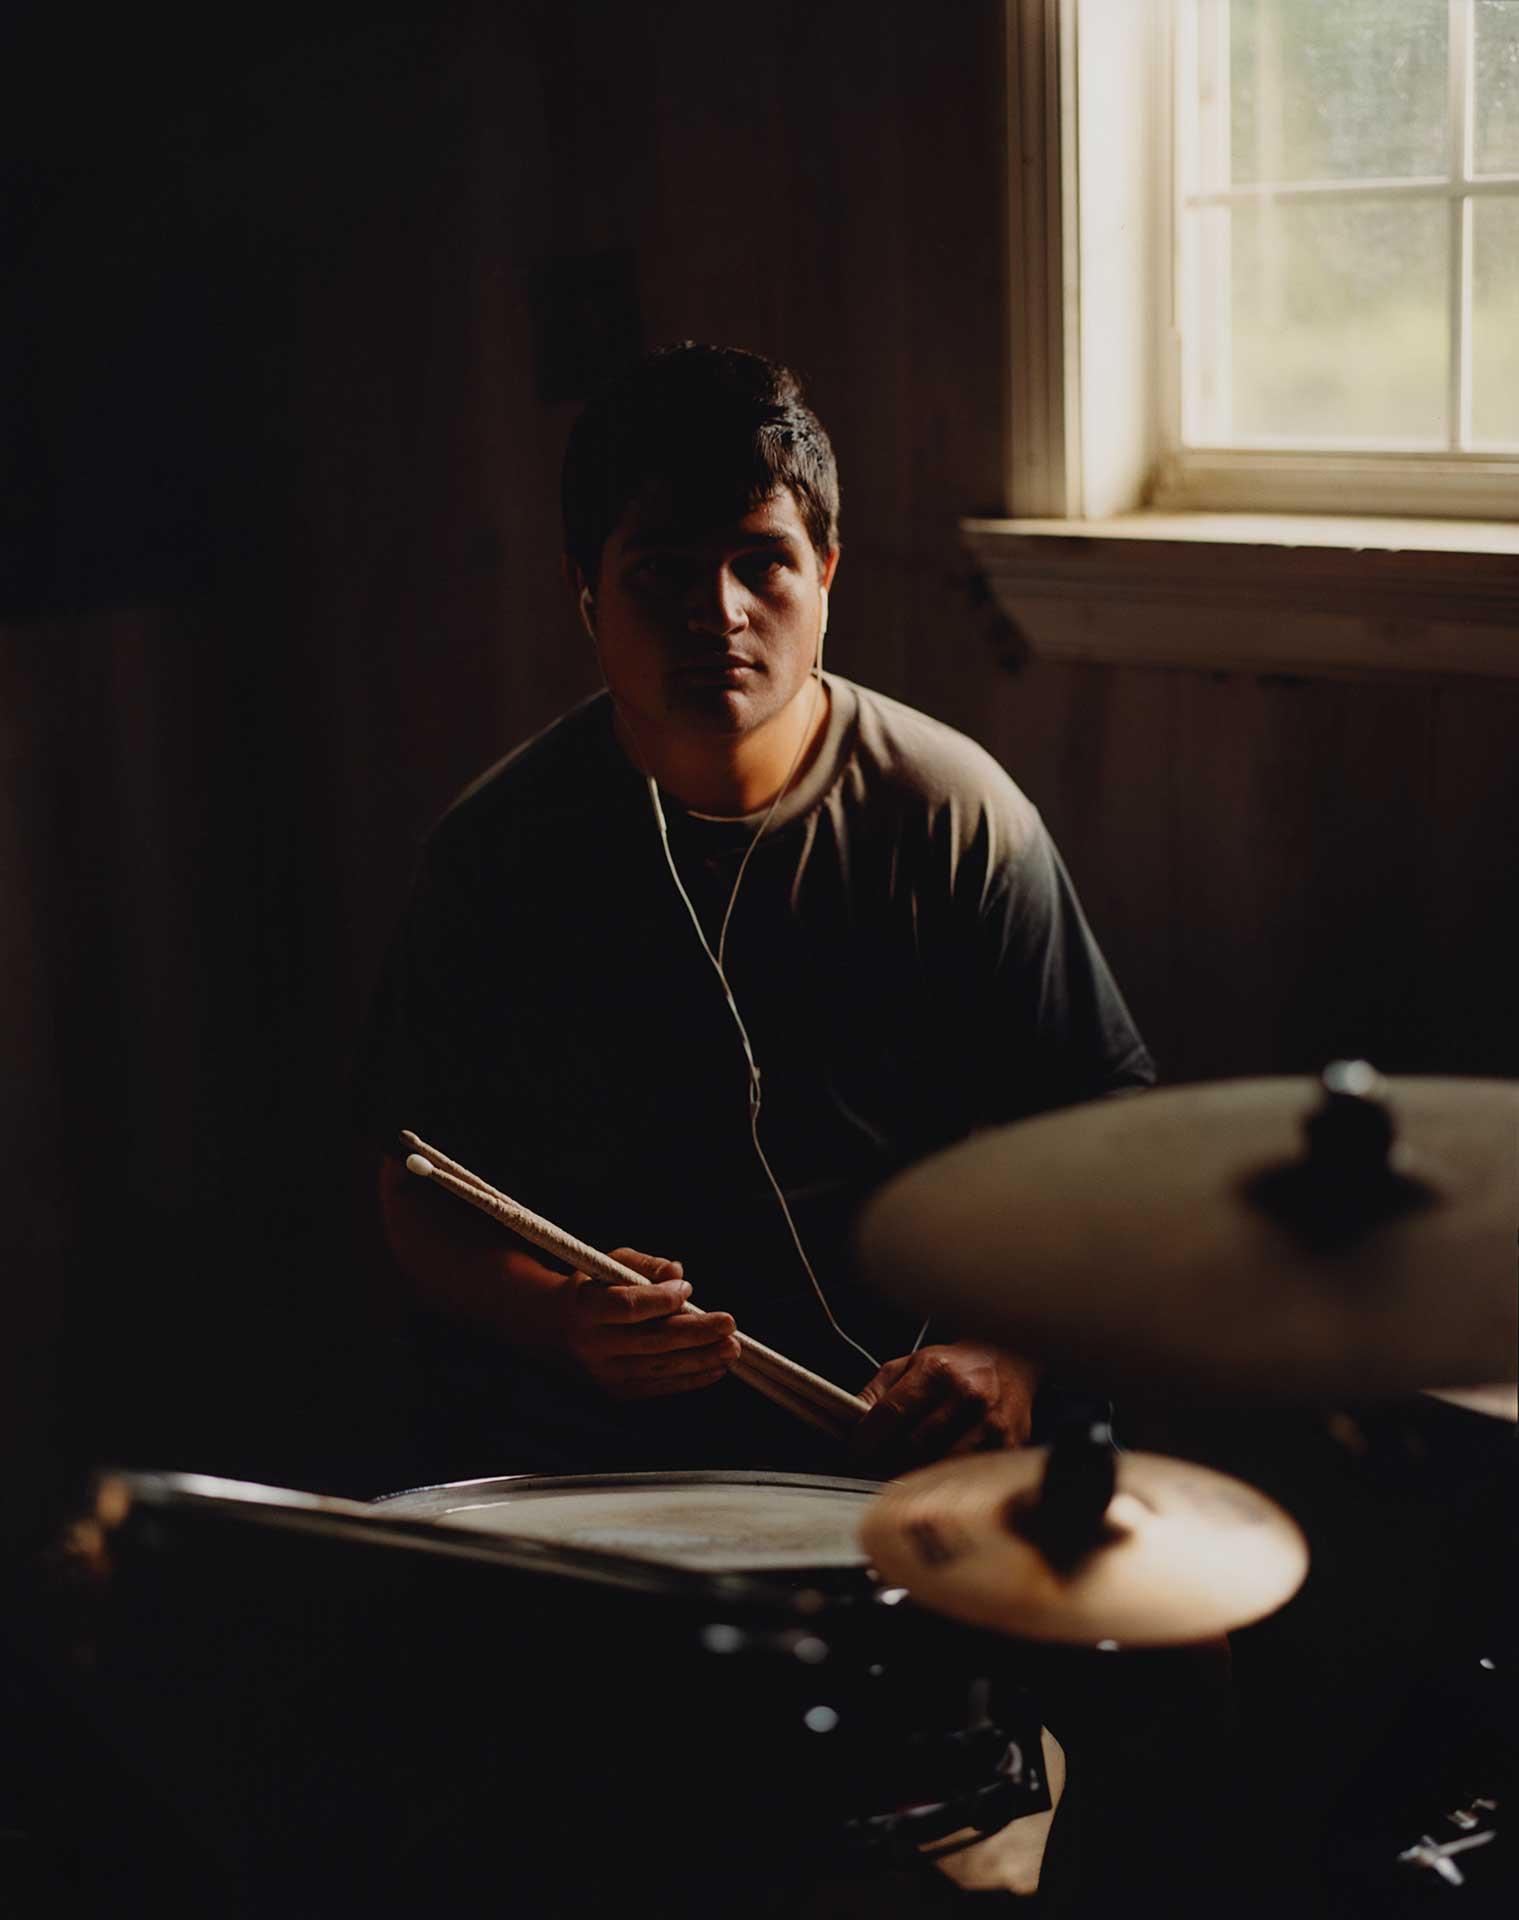 Luke Dugas